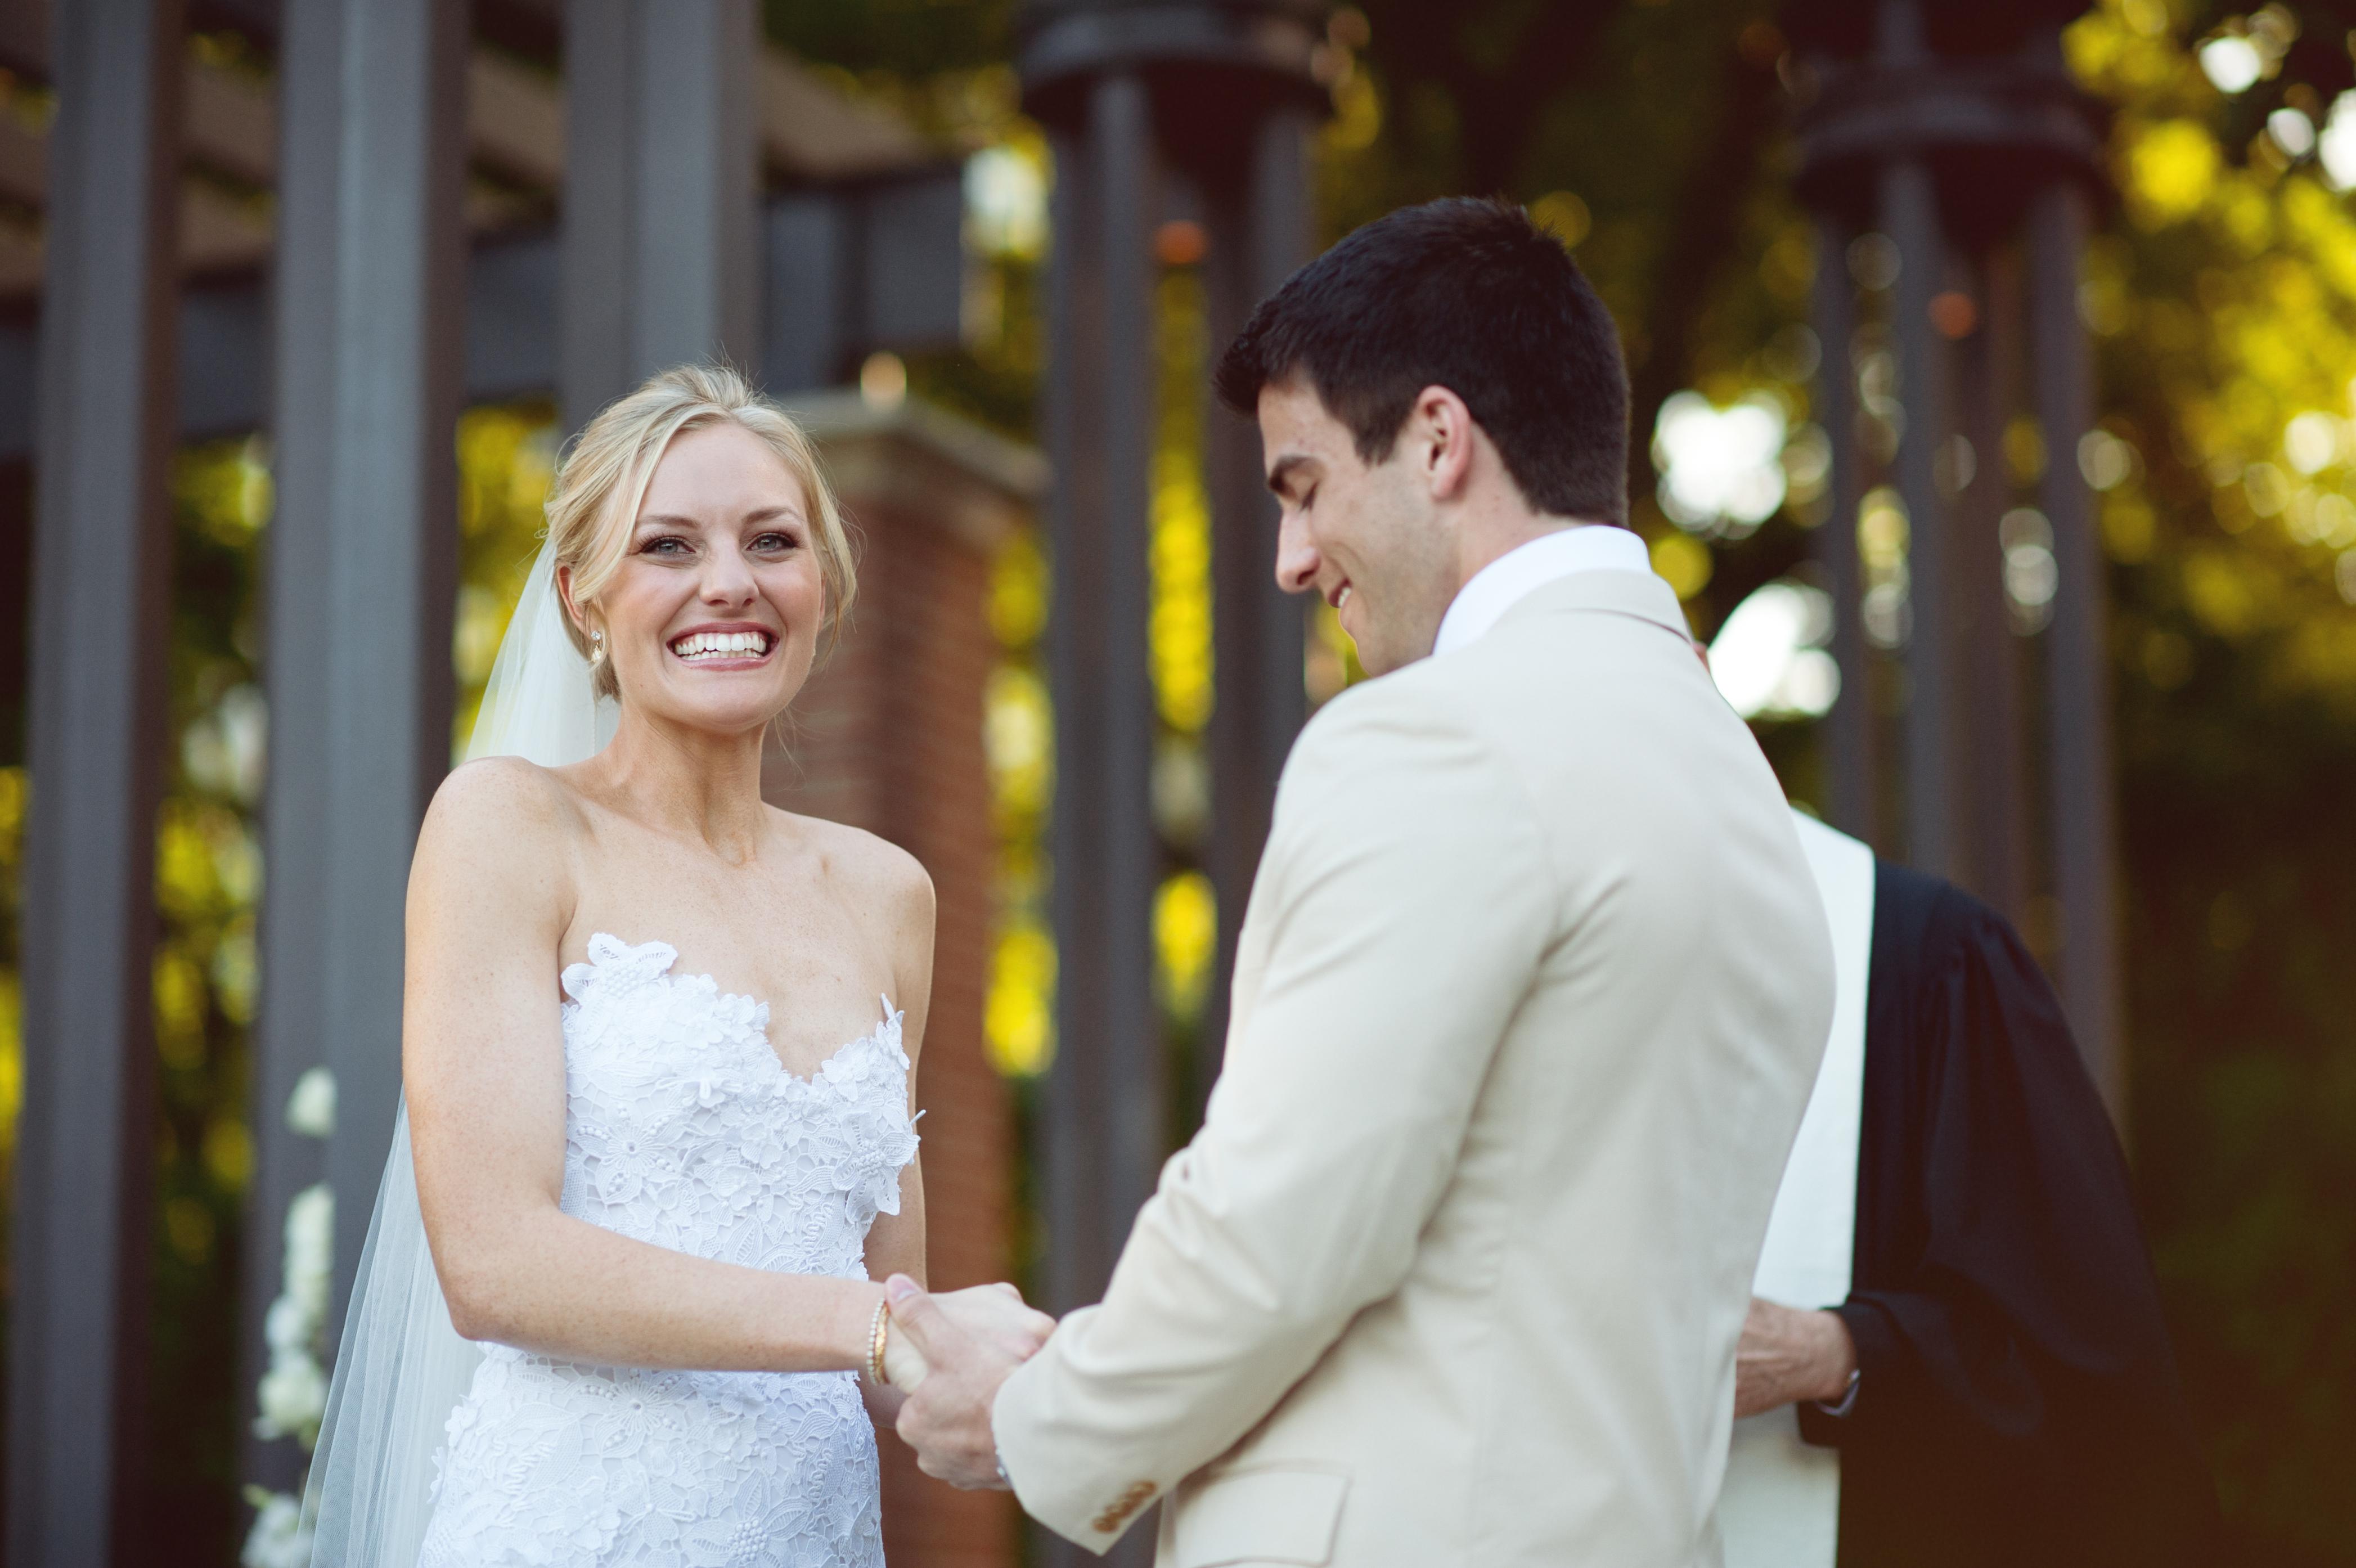 Ceremony, Flowers & Decor, Bride, Groom, Jen kevin